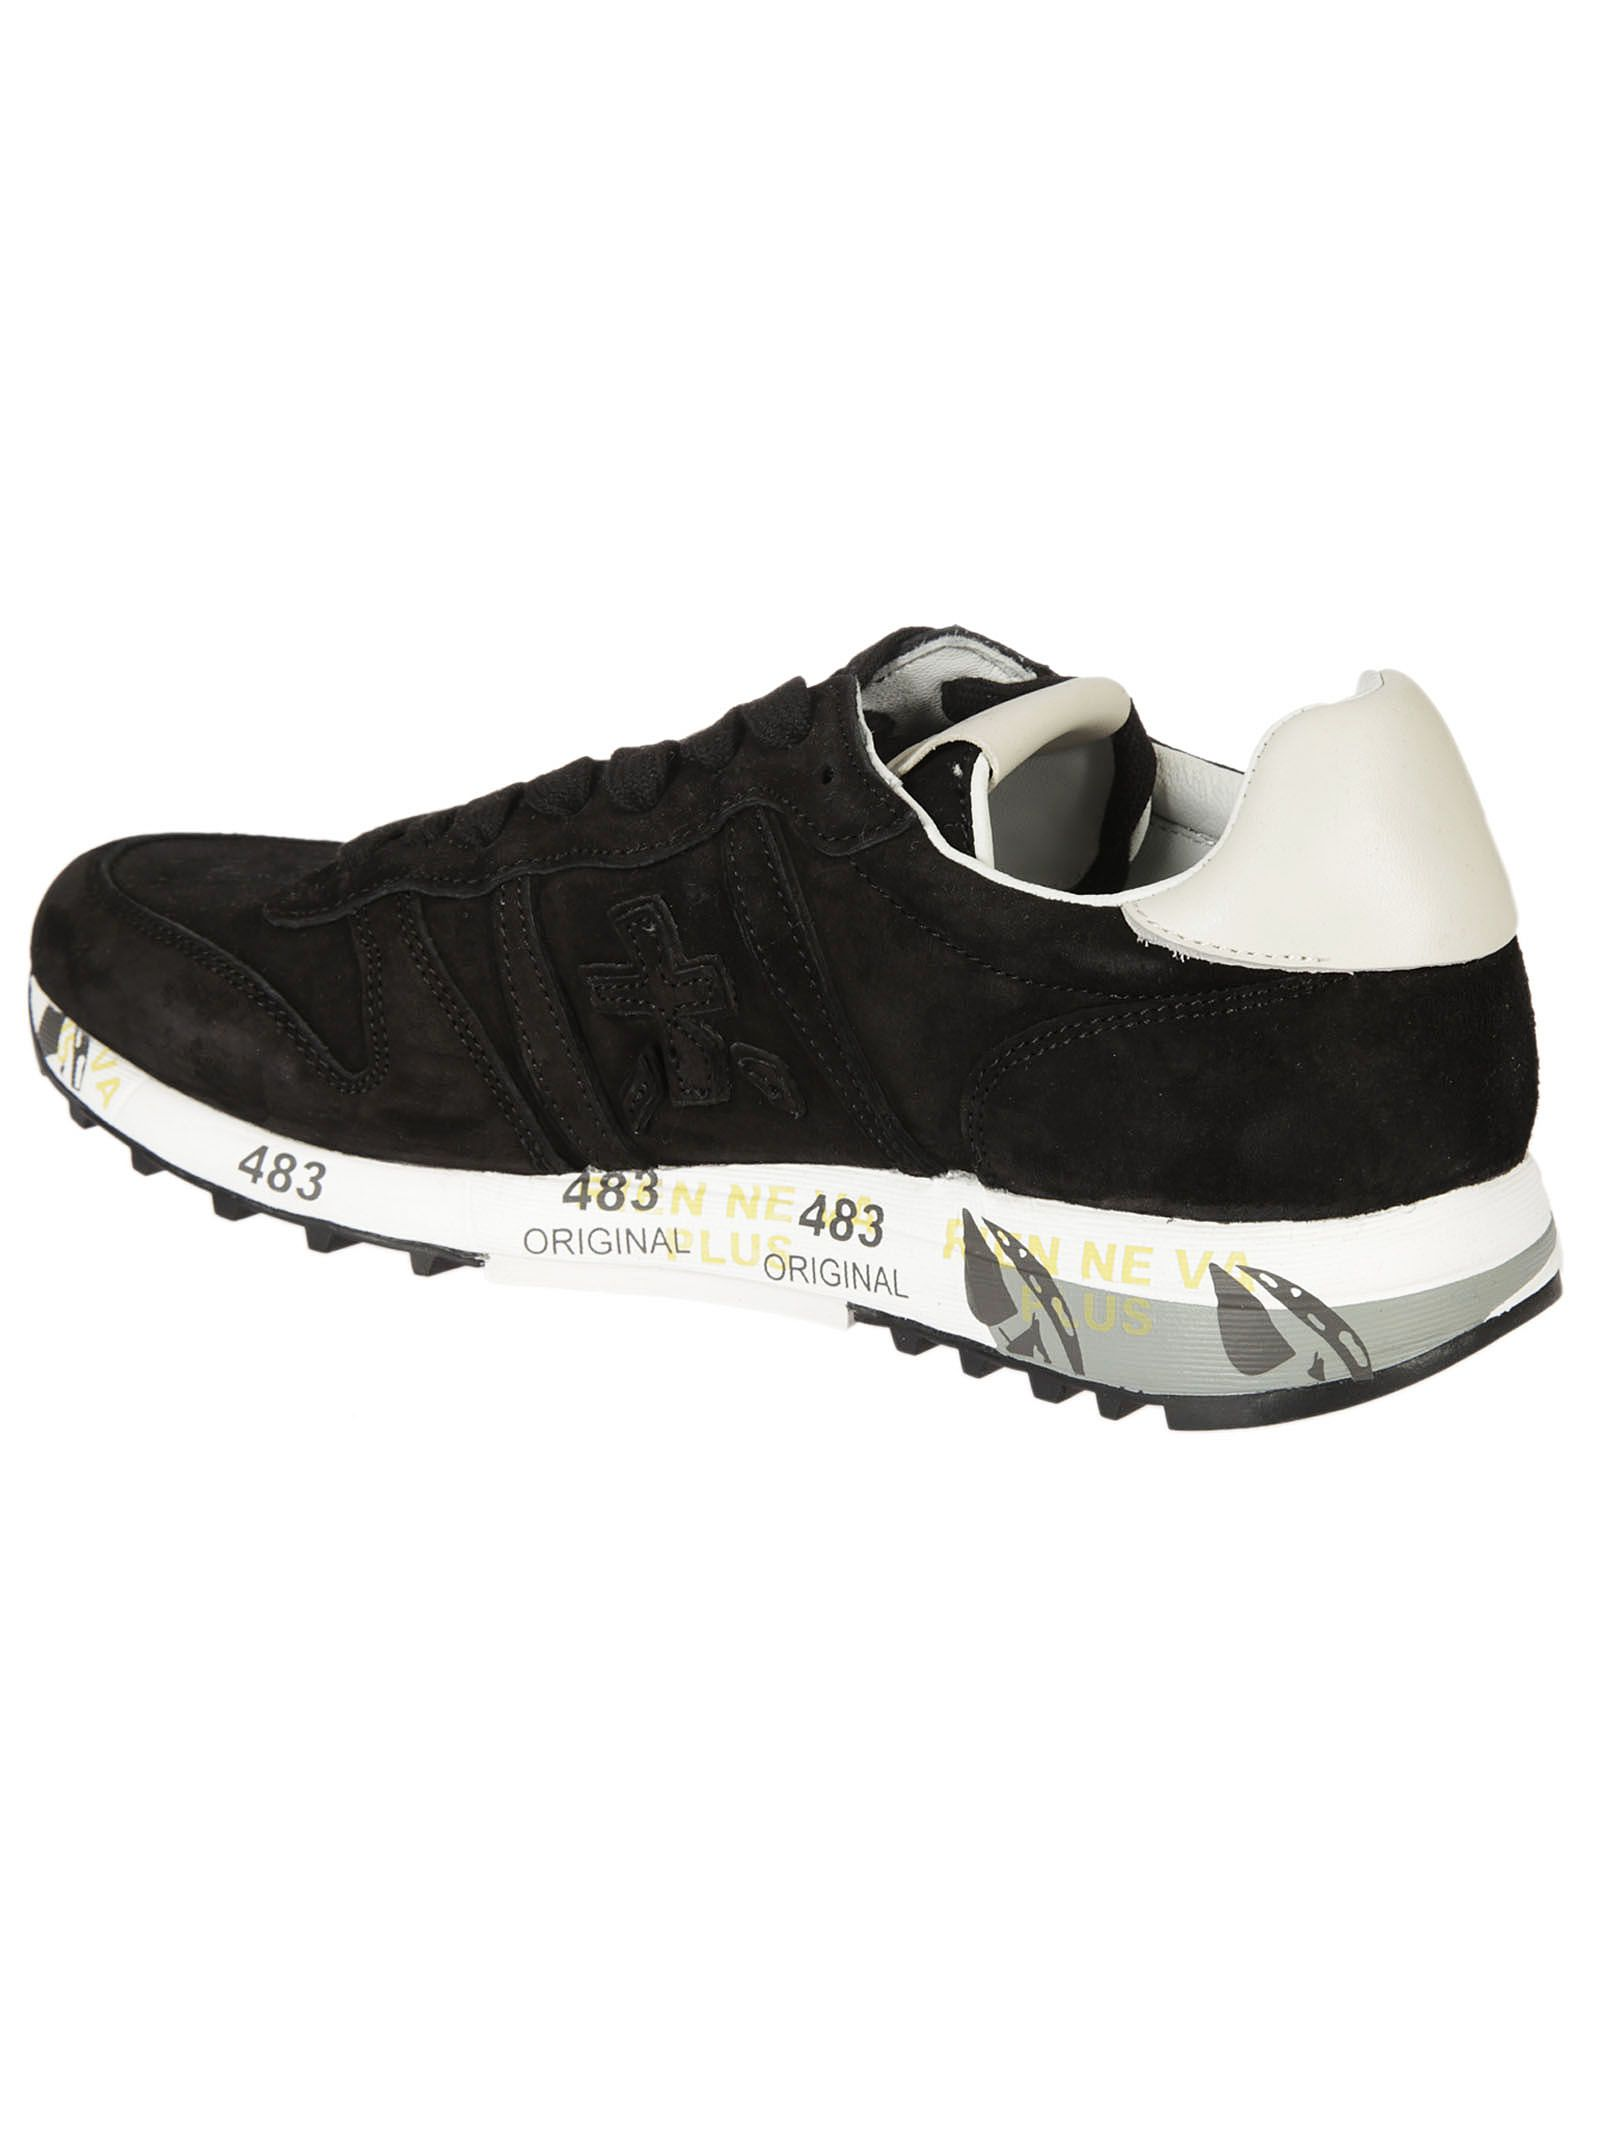 Premiata Eric Var sneakers dXqh4ib1mM